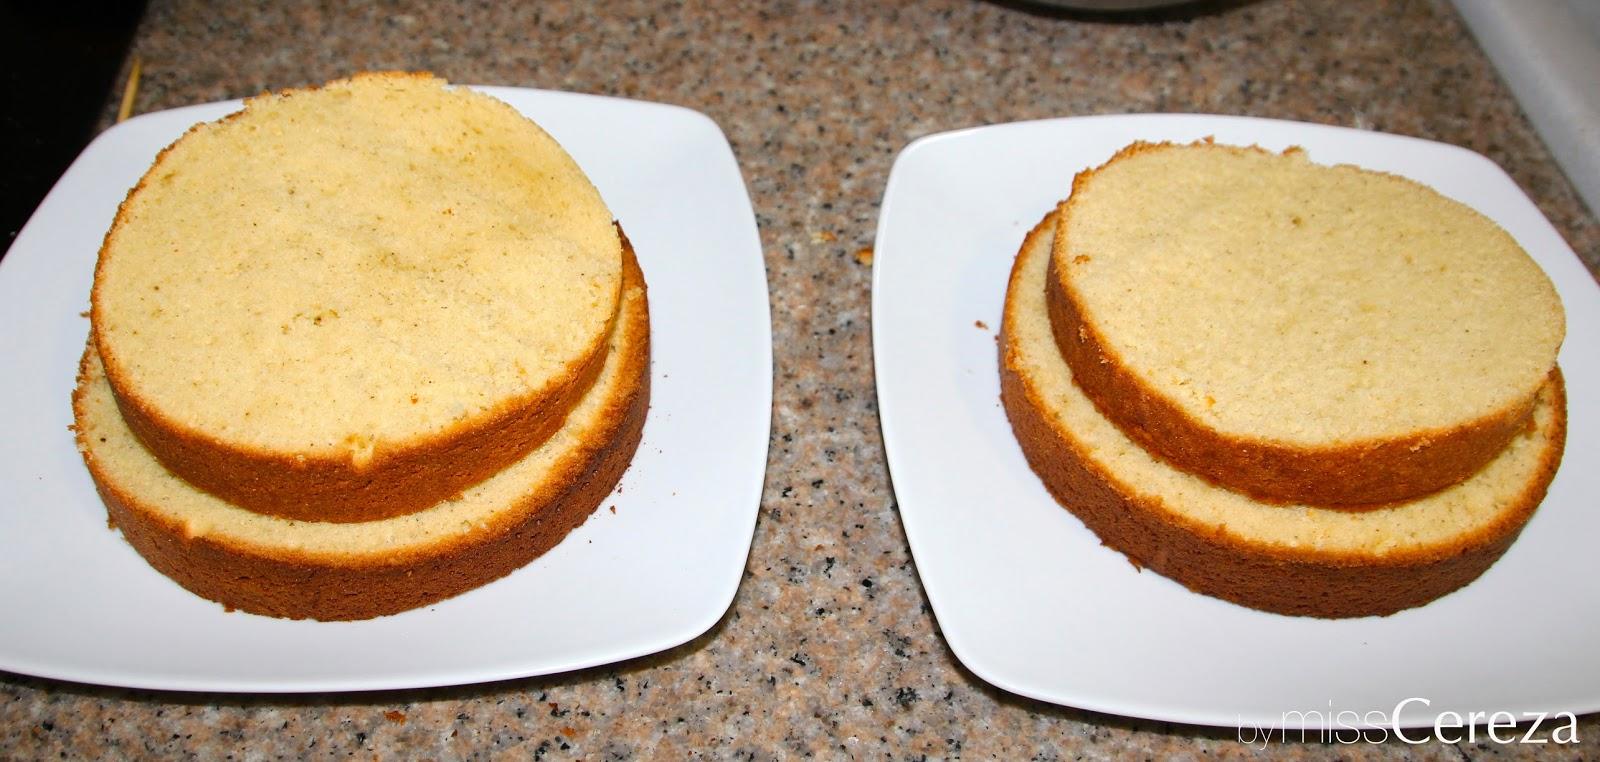 montando dos naked cakes